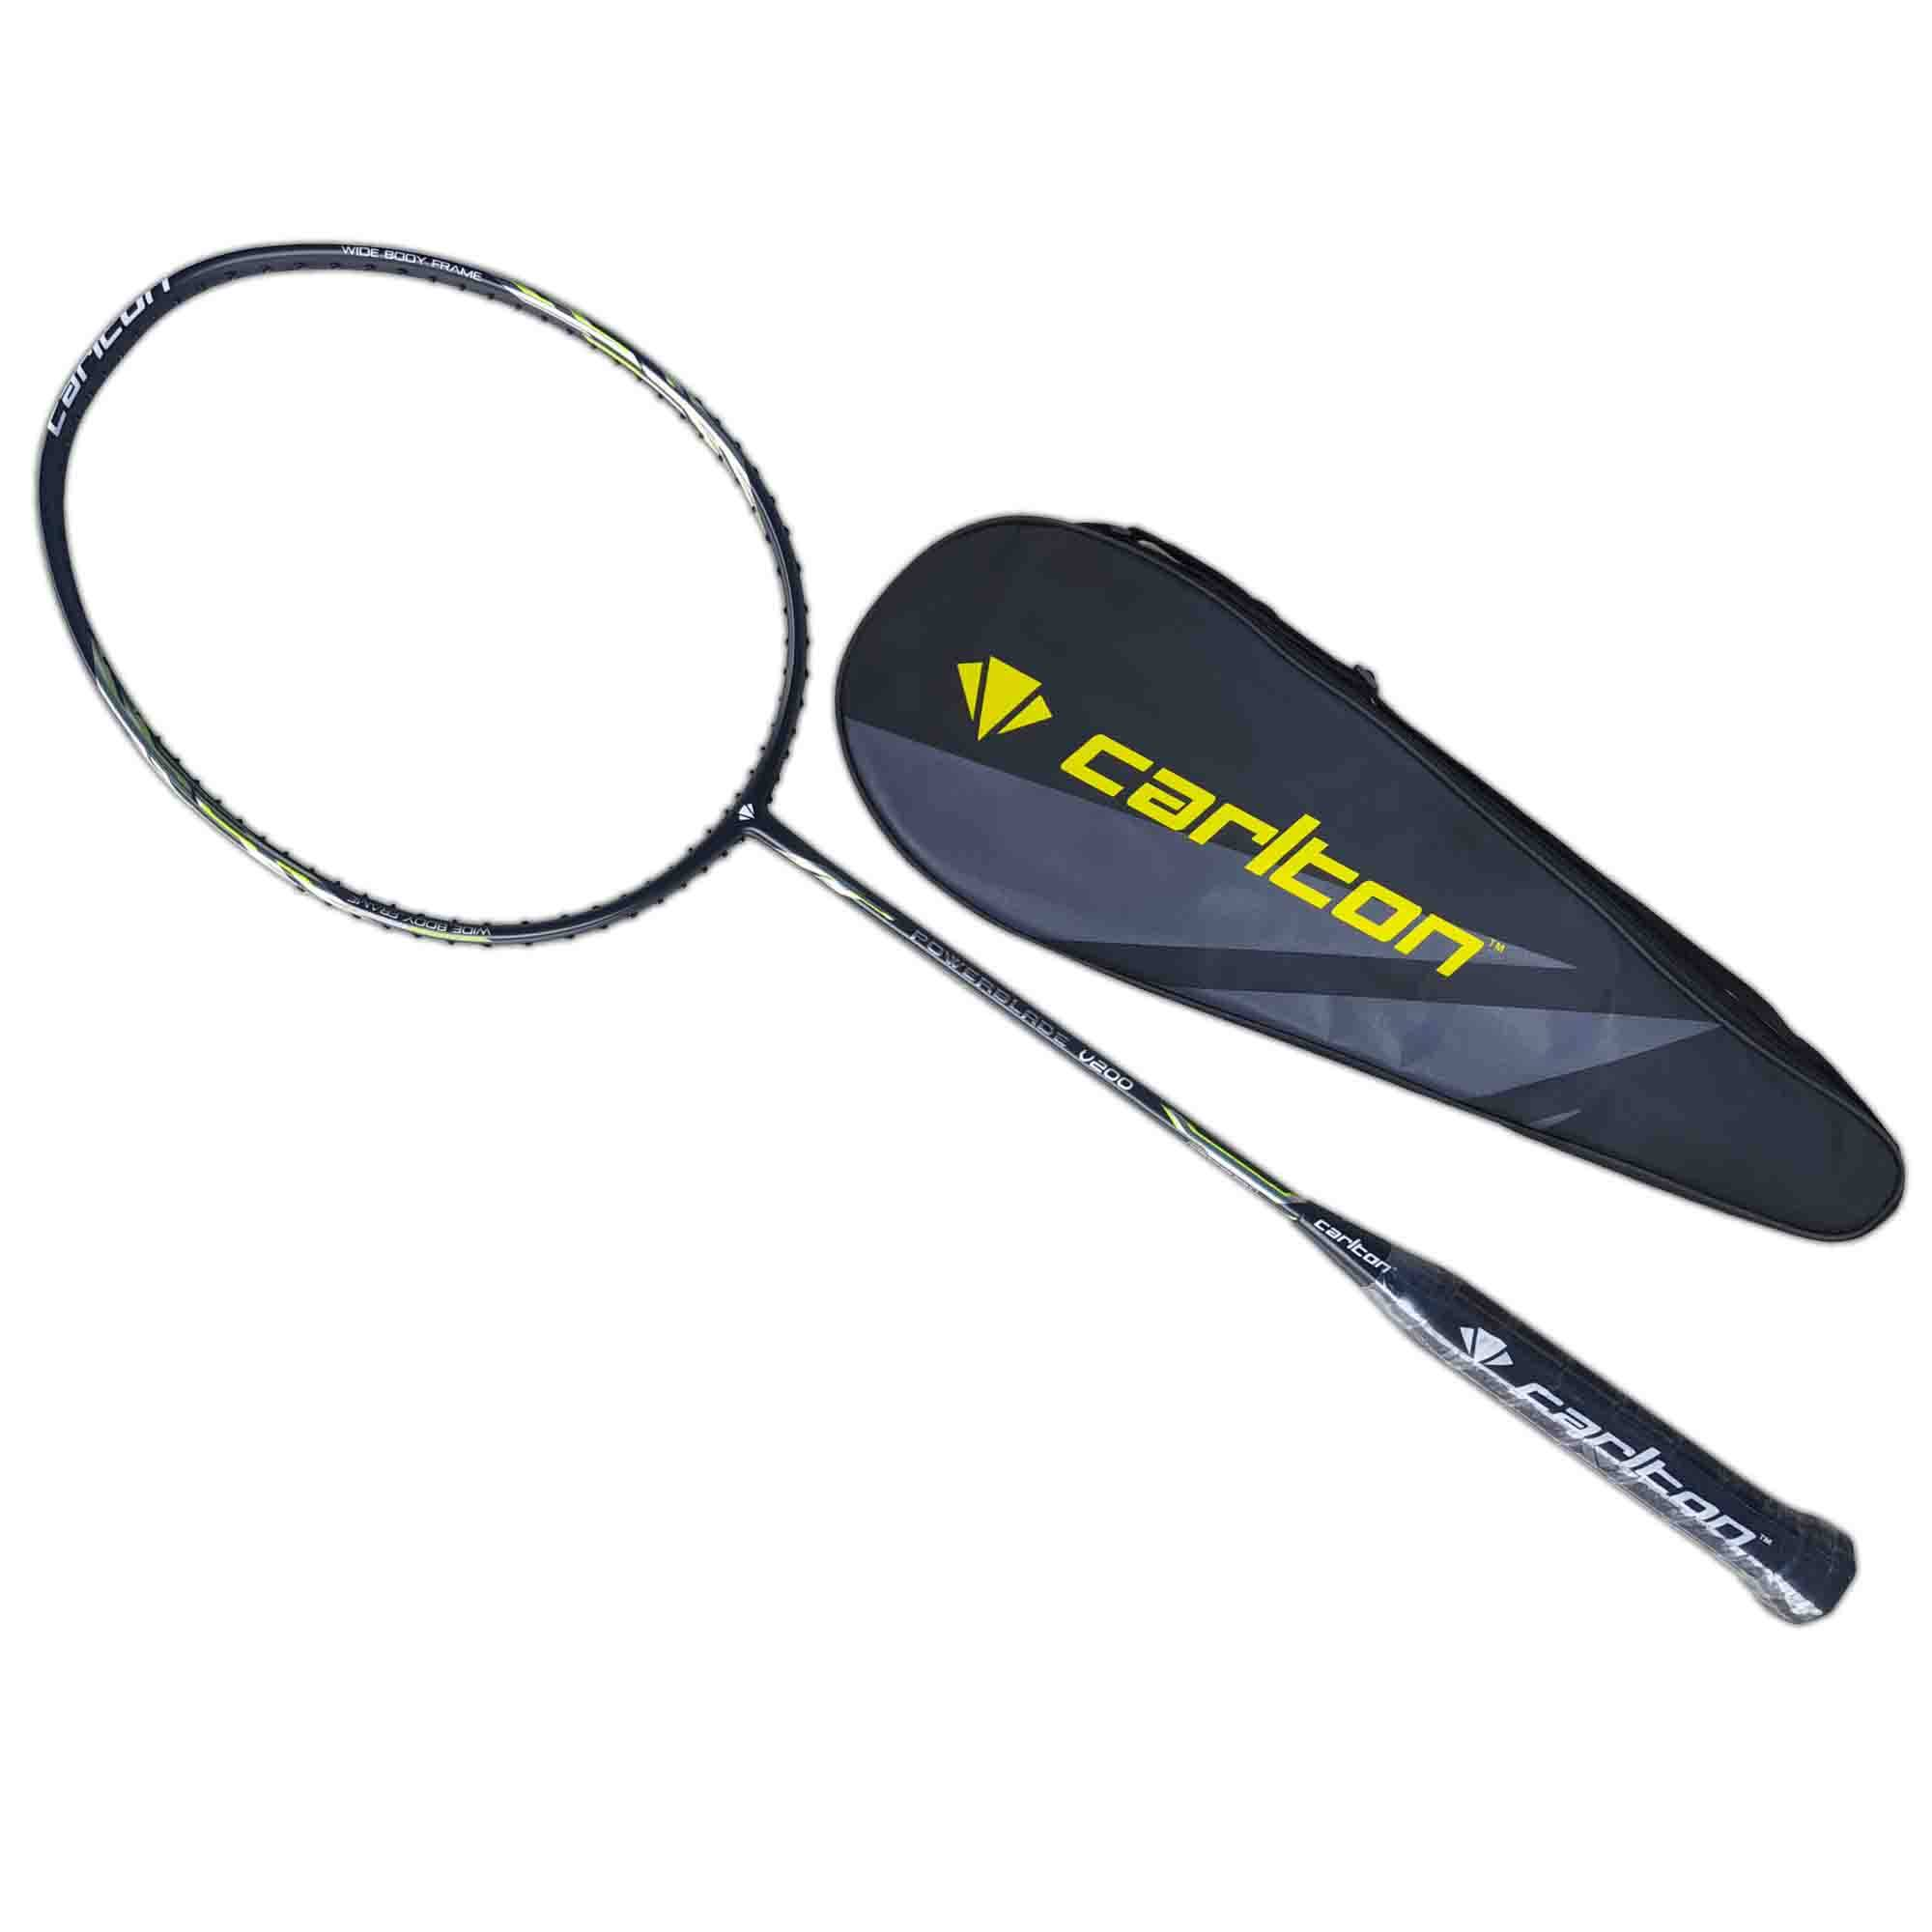 Carlton Badminton Racket PowerBlade V200